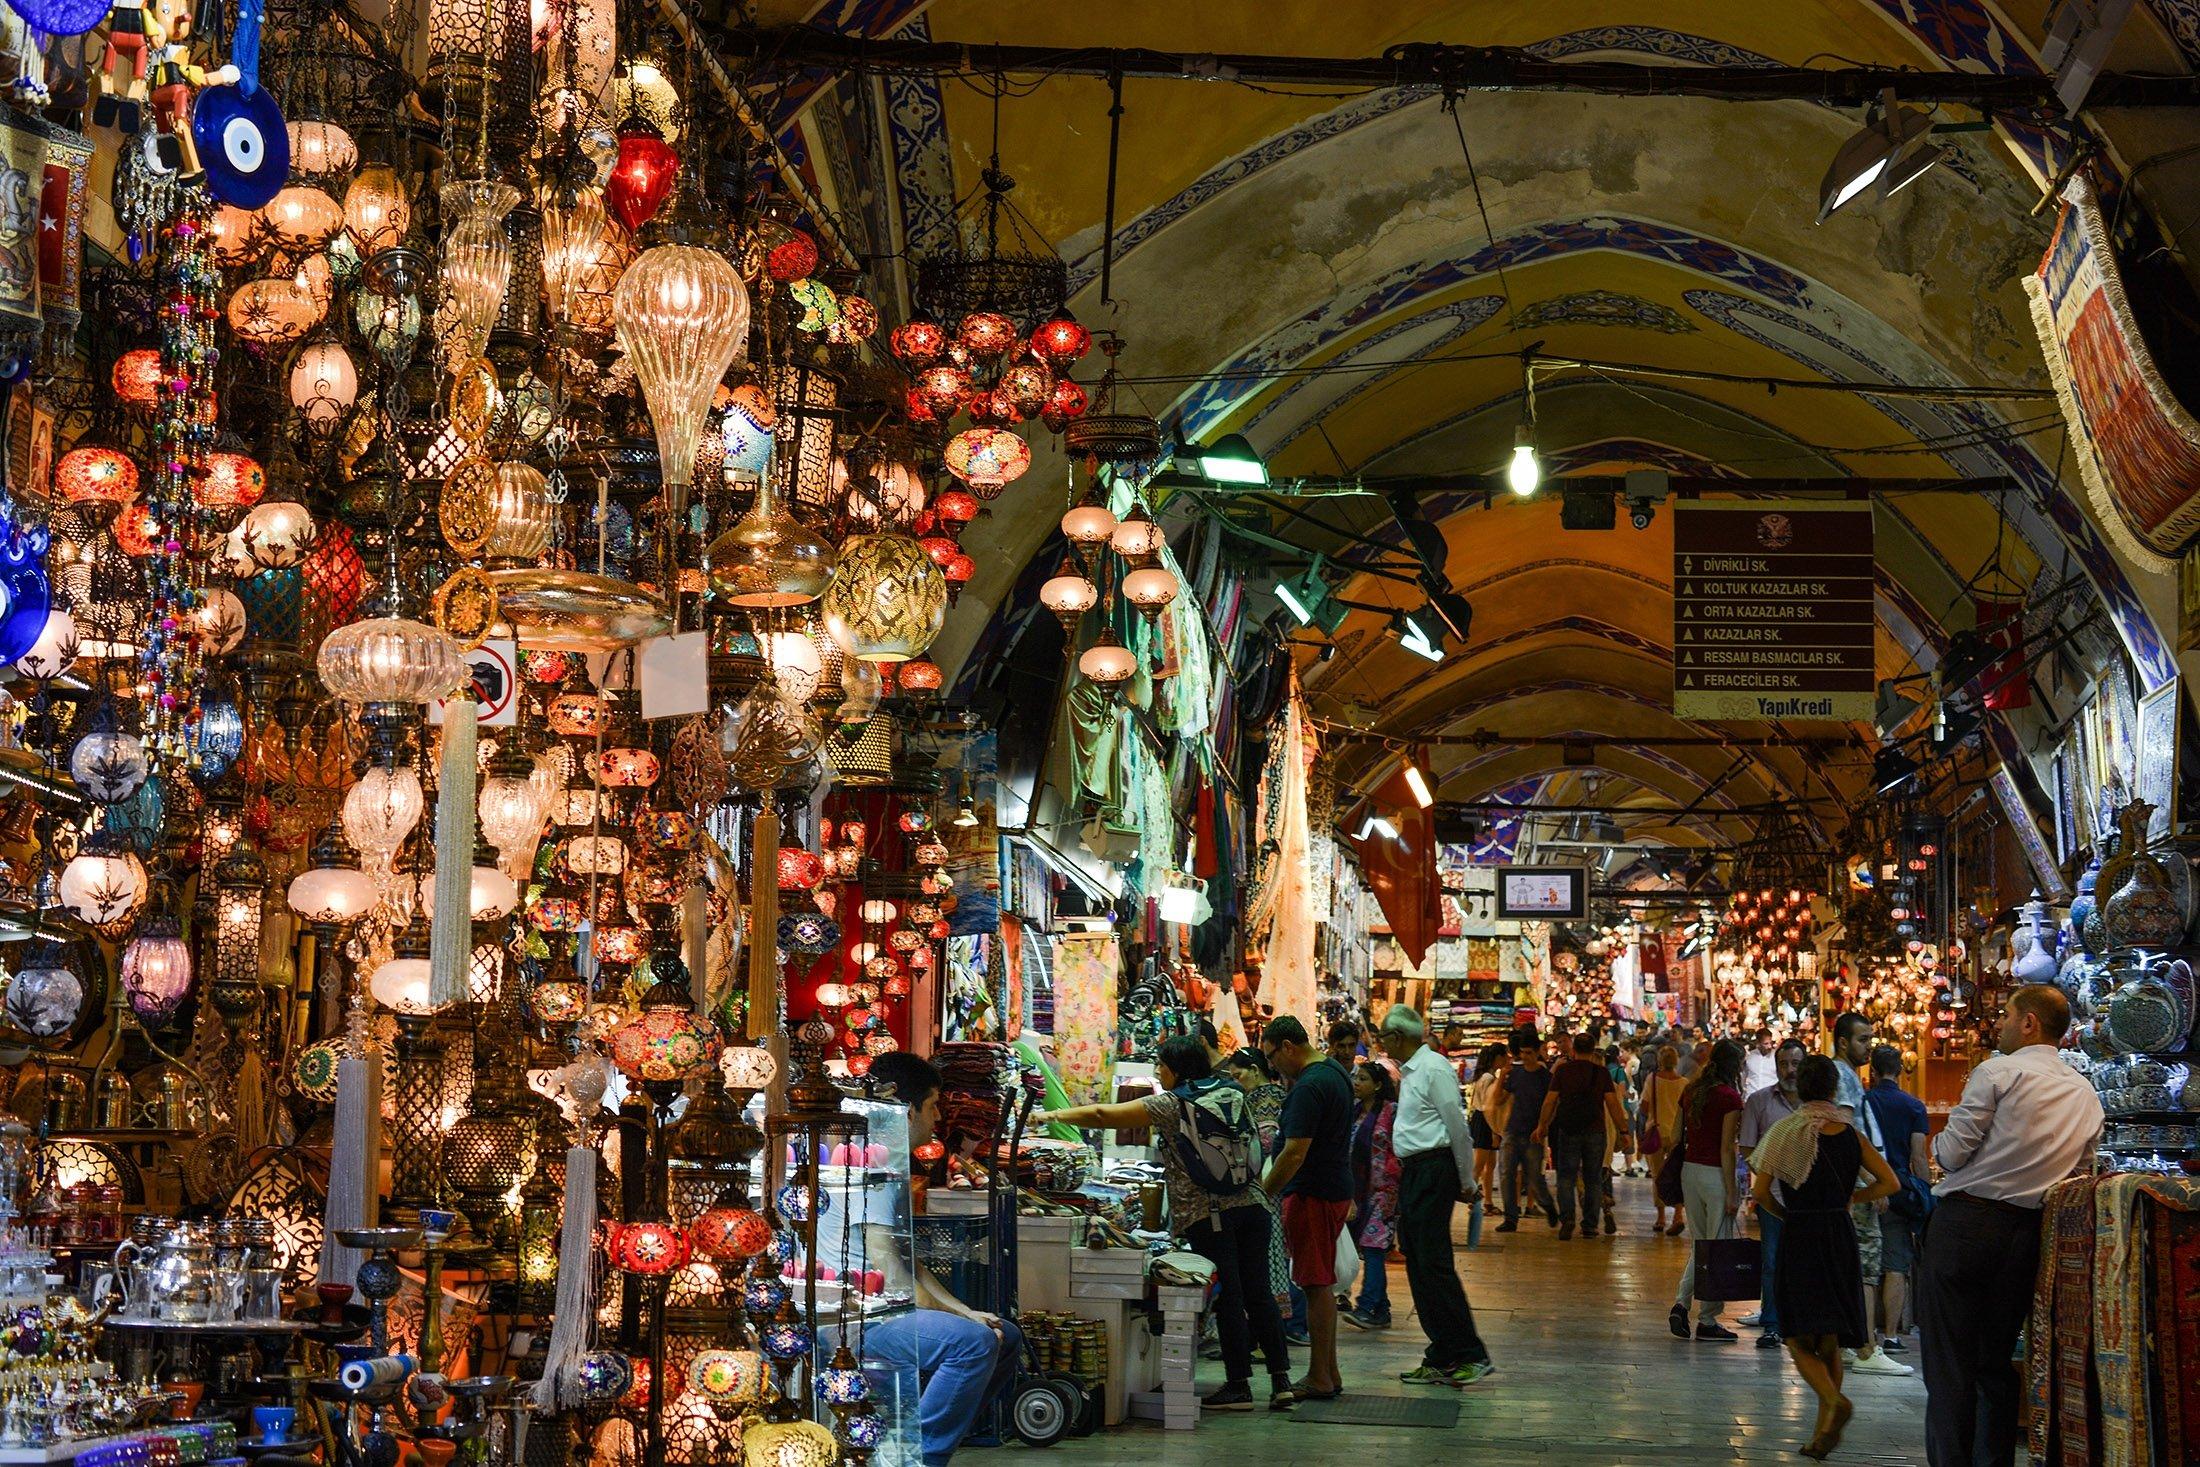 General view of Grand Bazaar in Turkey's Istanbul. (Shutterstock Photo)